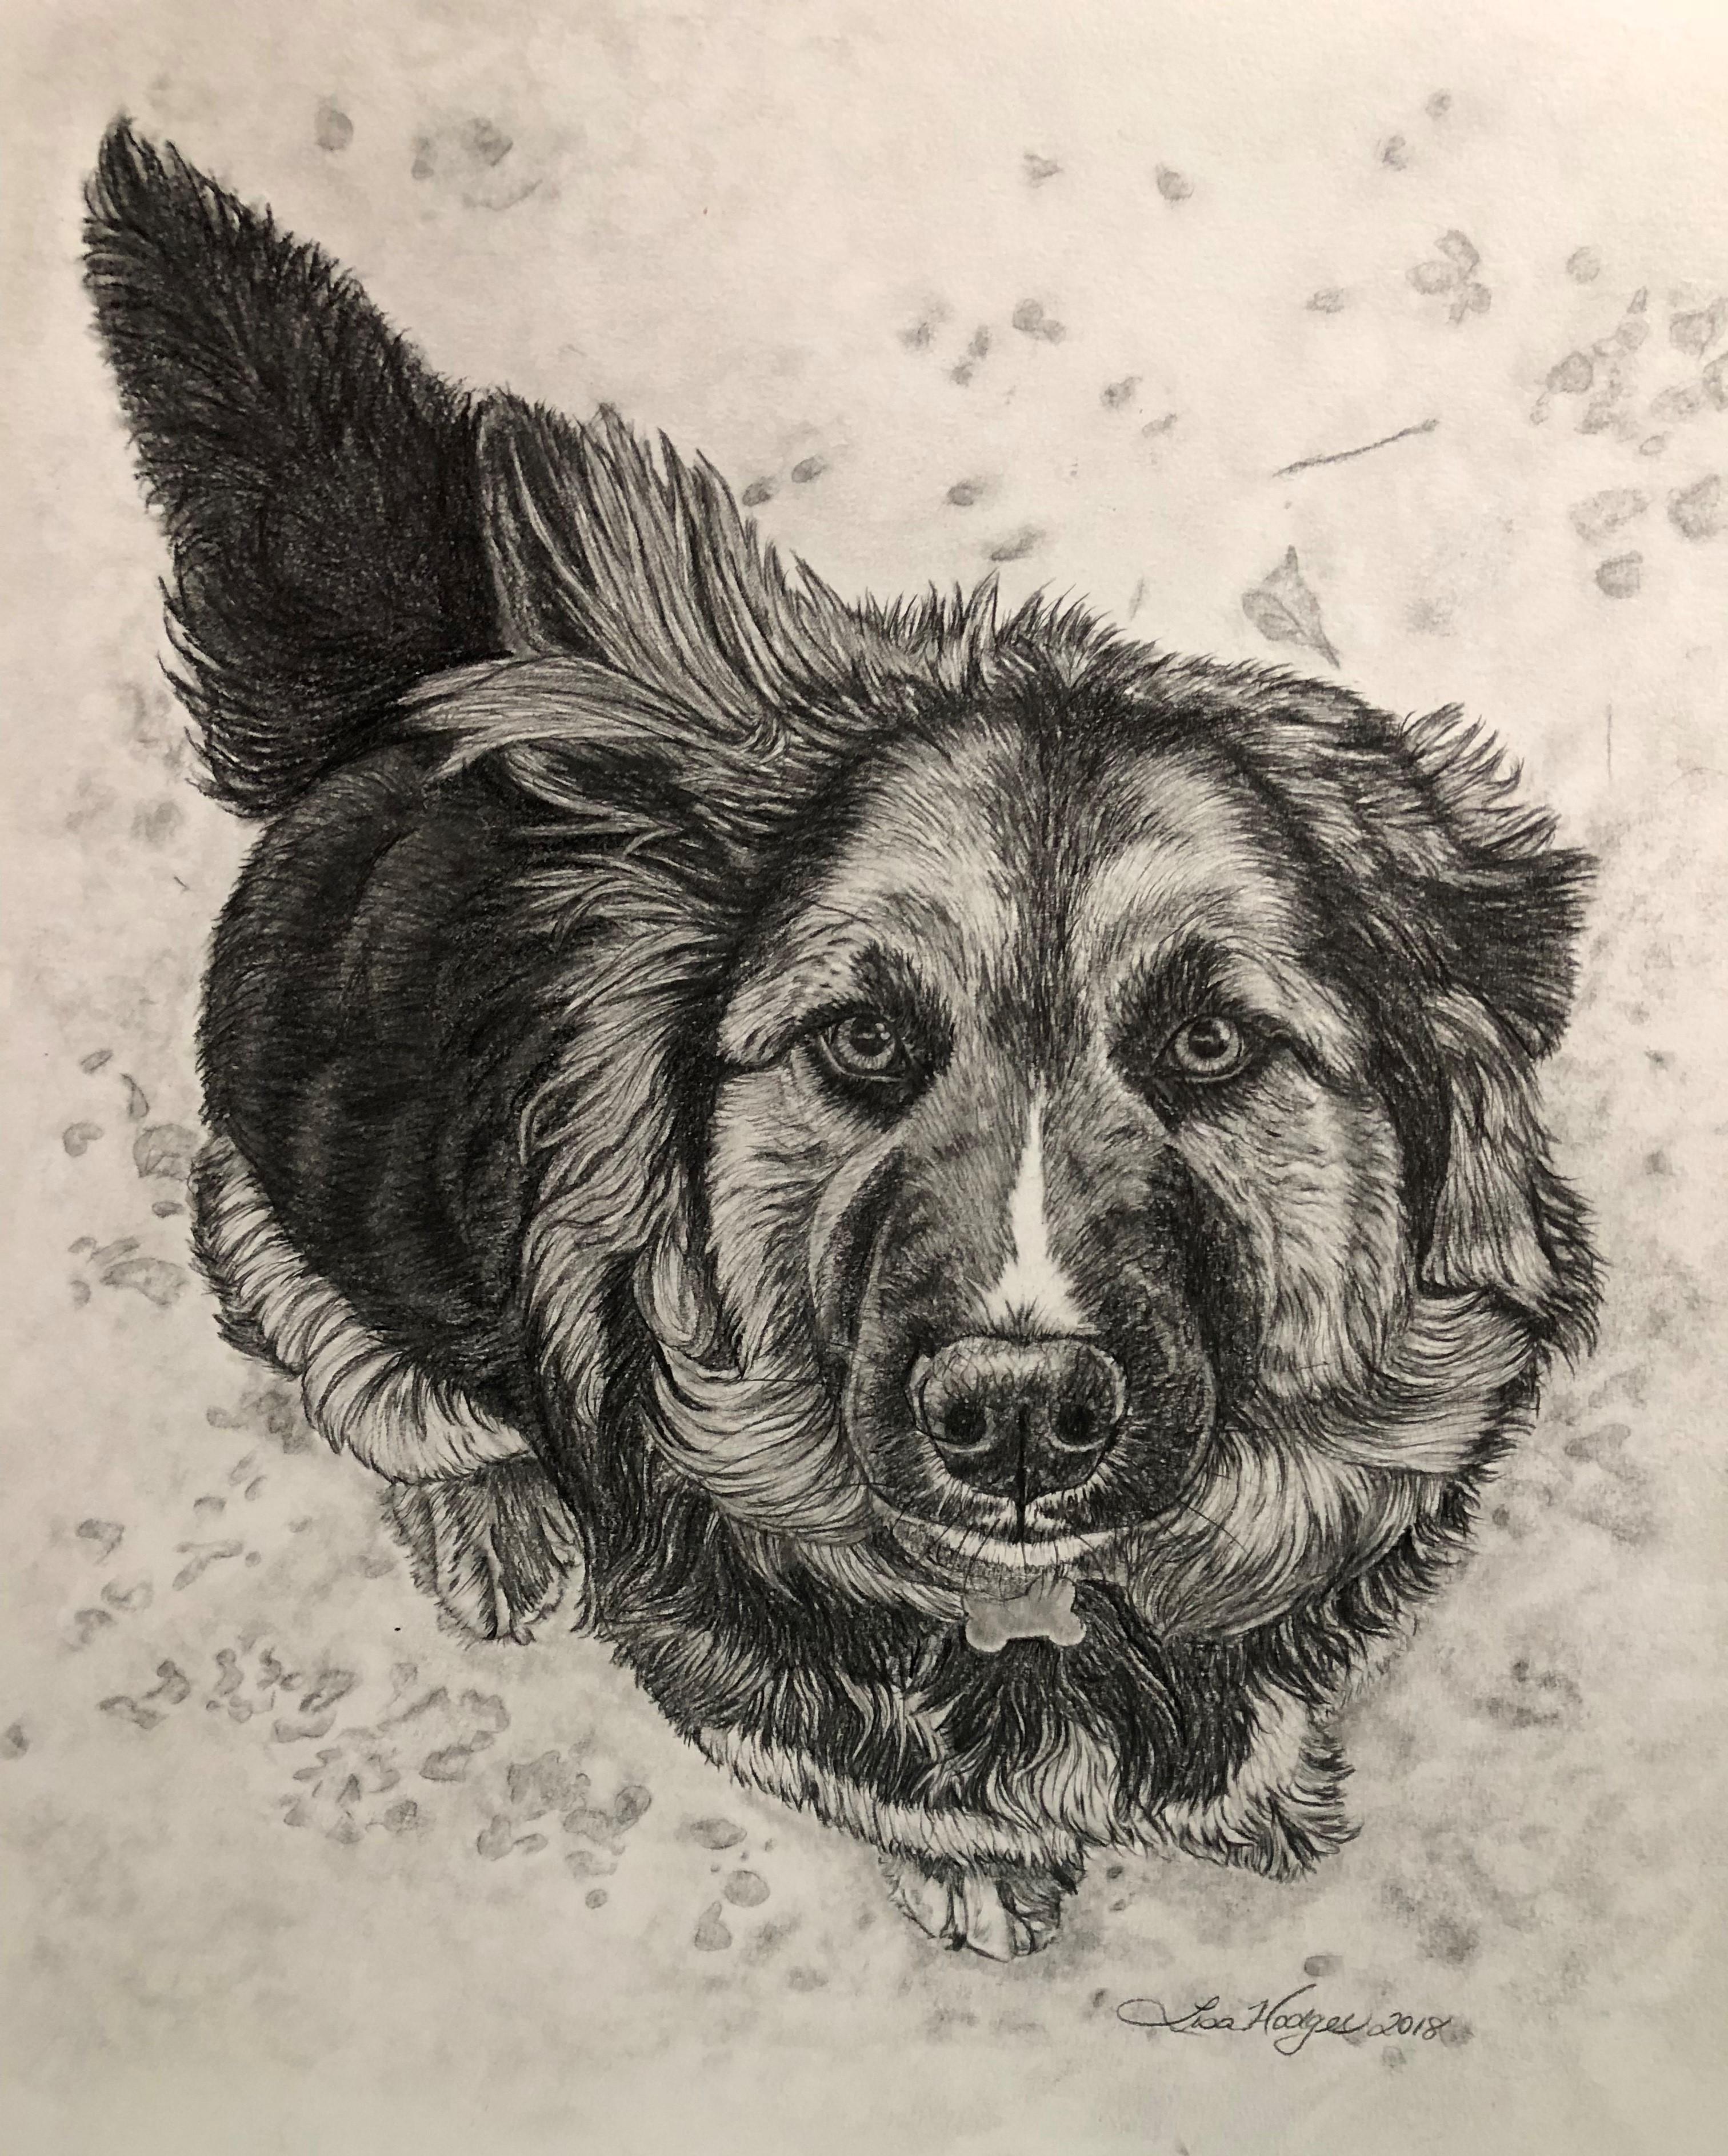 Pet Portraits and Artwork